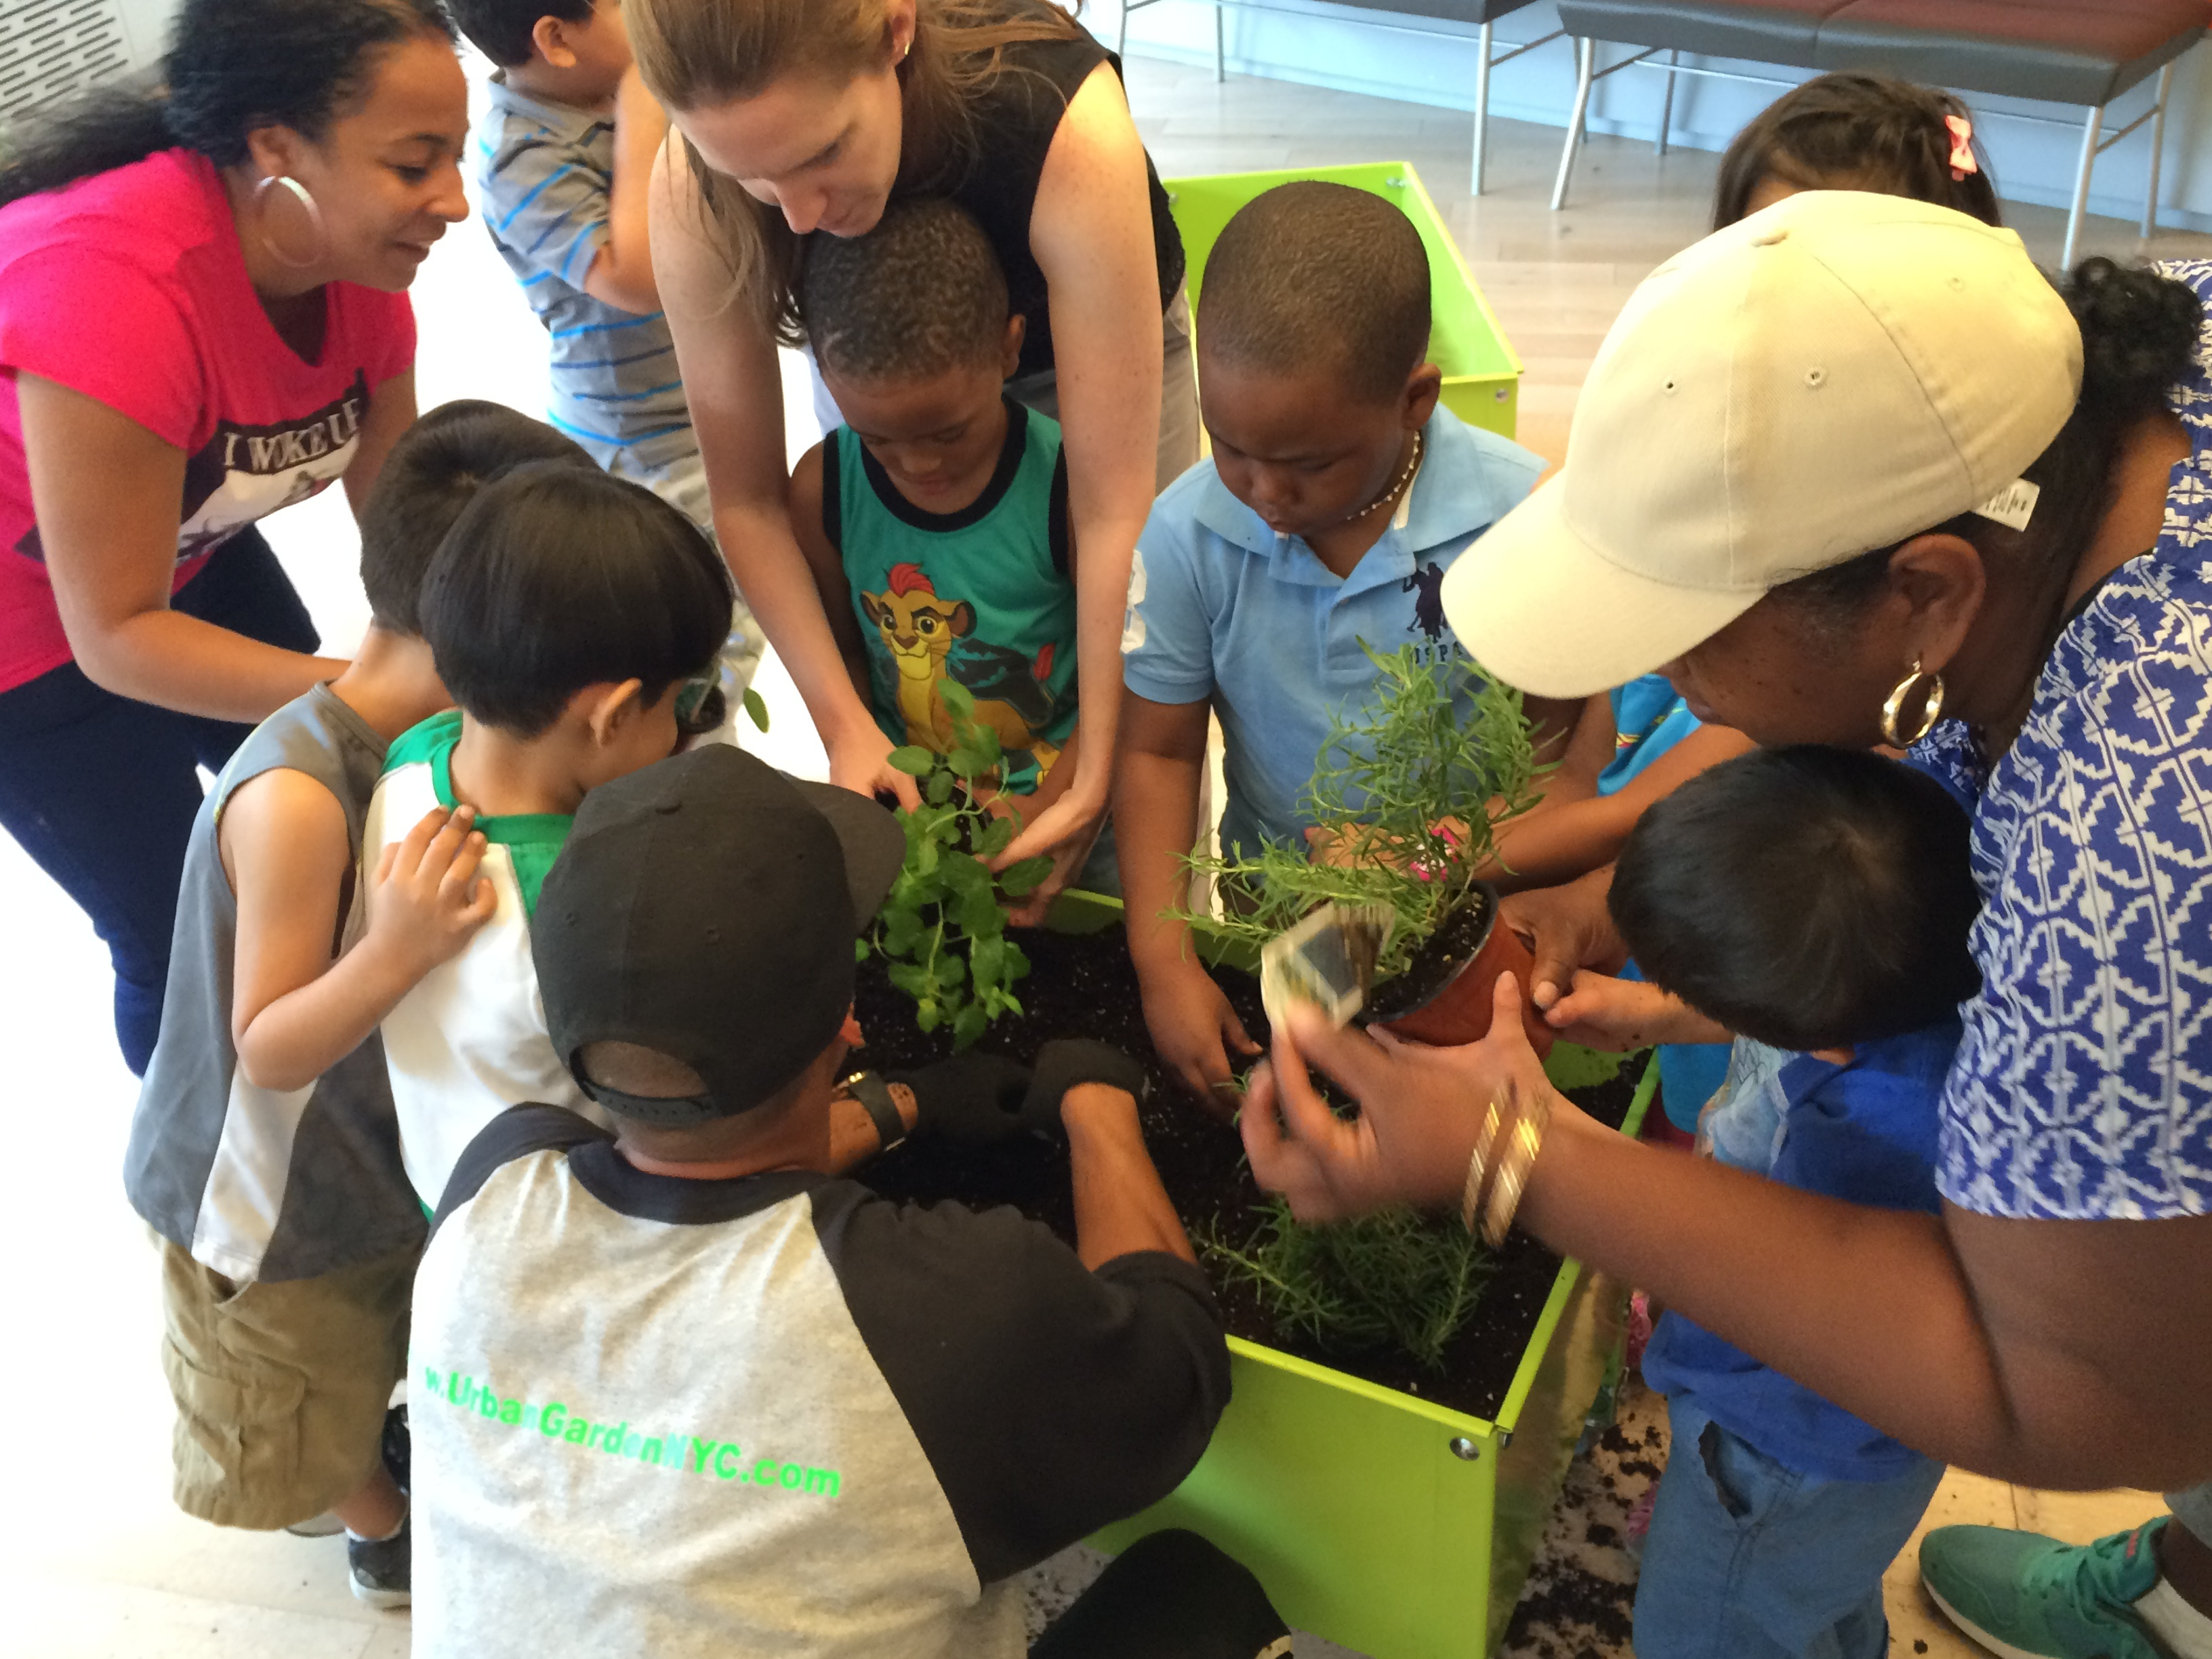 Provider Health Spotlight on the Kennedy Child Study Center (KCSC)